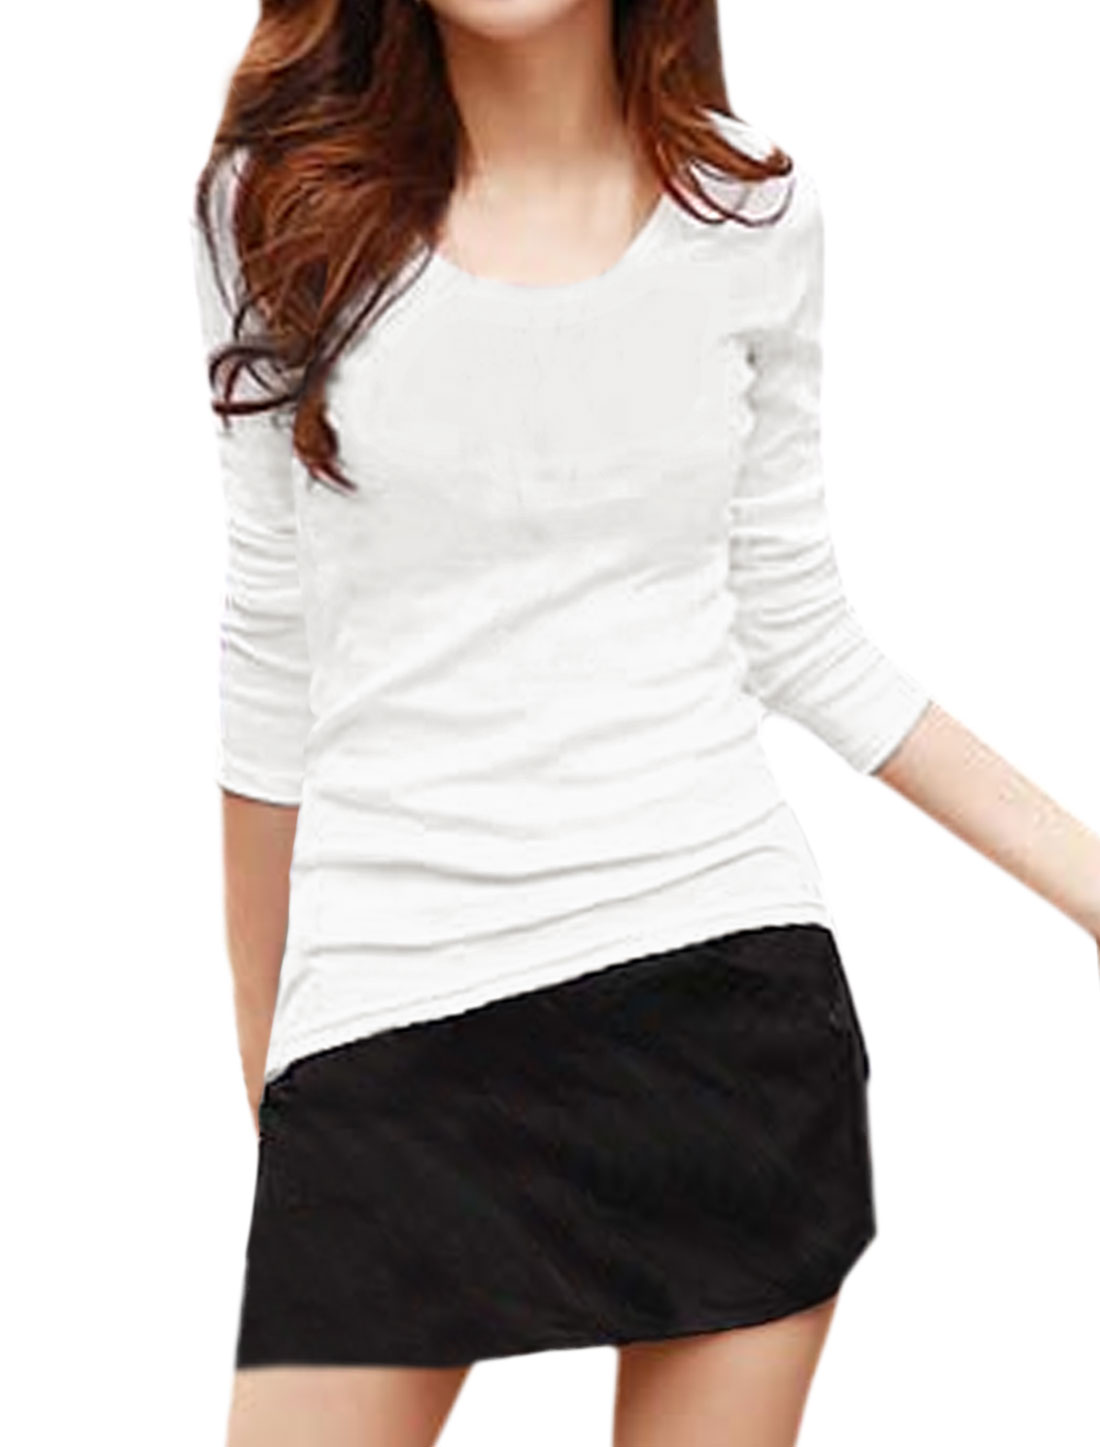 Women Long Sleeves Asymmetric Hem Slim Fit Tee Shirt White M